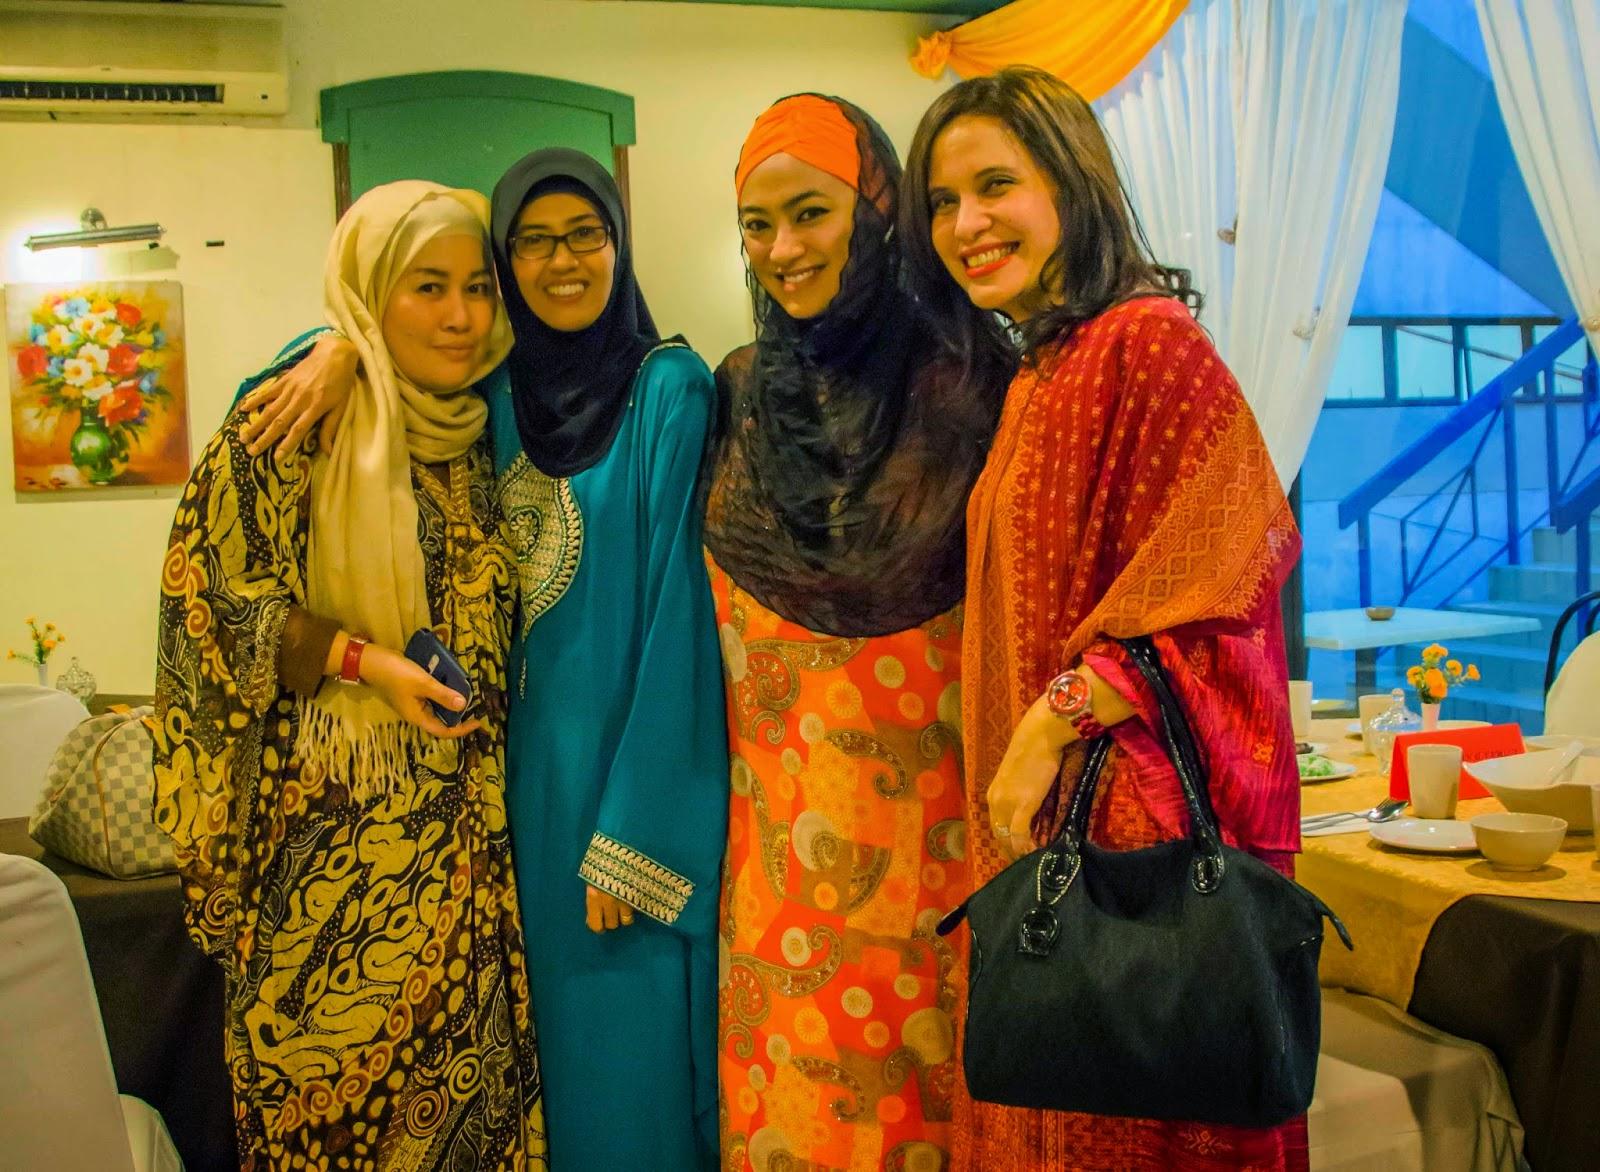 Foto Diatas Adalah Teman Teman Saya Di Malaysia Rein Ana Dan Jen Retno Dimana Saya Dan Keluarga Diundang Untuk Acara Buka Puasa Bersama Di Executive Club